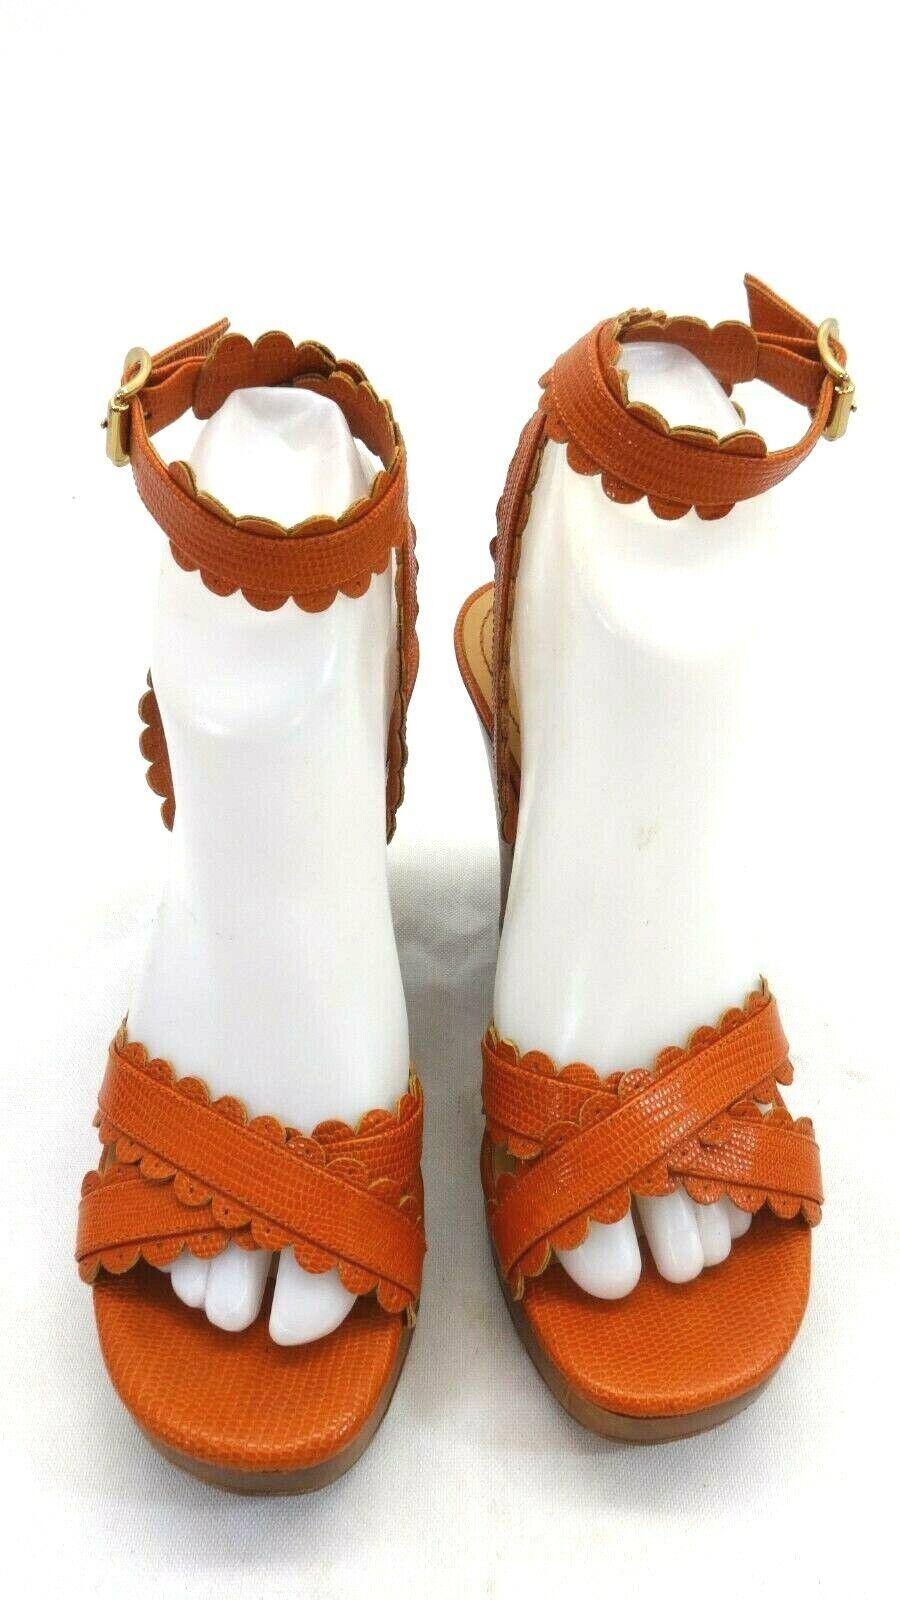 SEE BY CHLOE WOMEN'S BURNT orange STRAPPY WEDGE HEELS SIZE 6 US